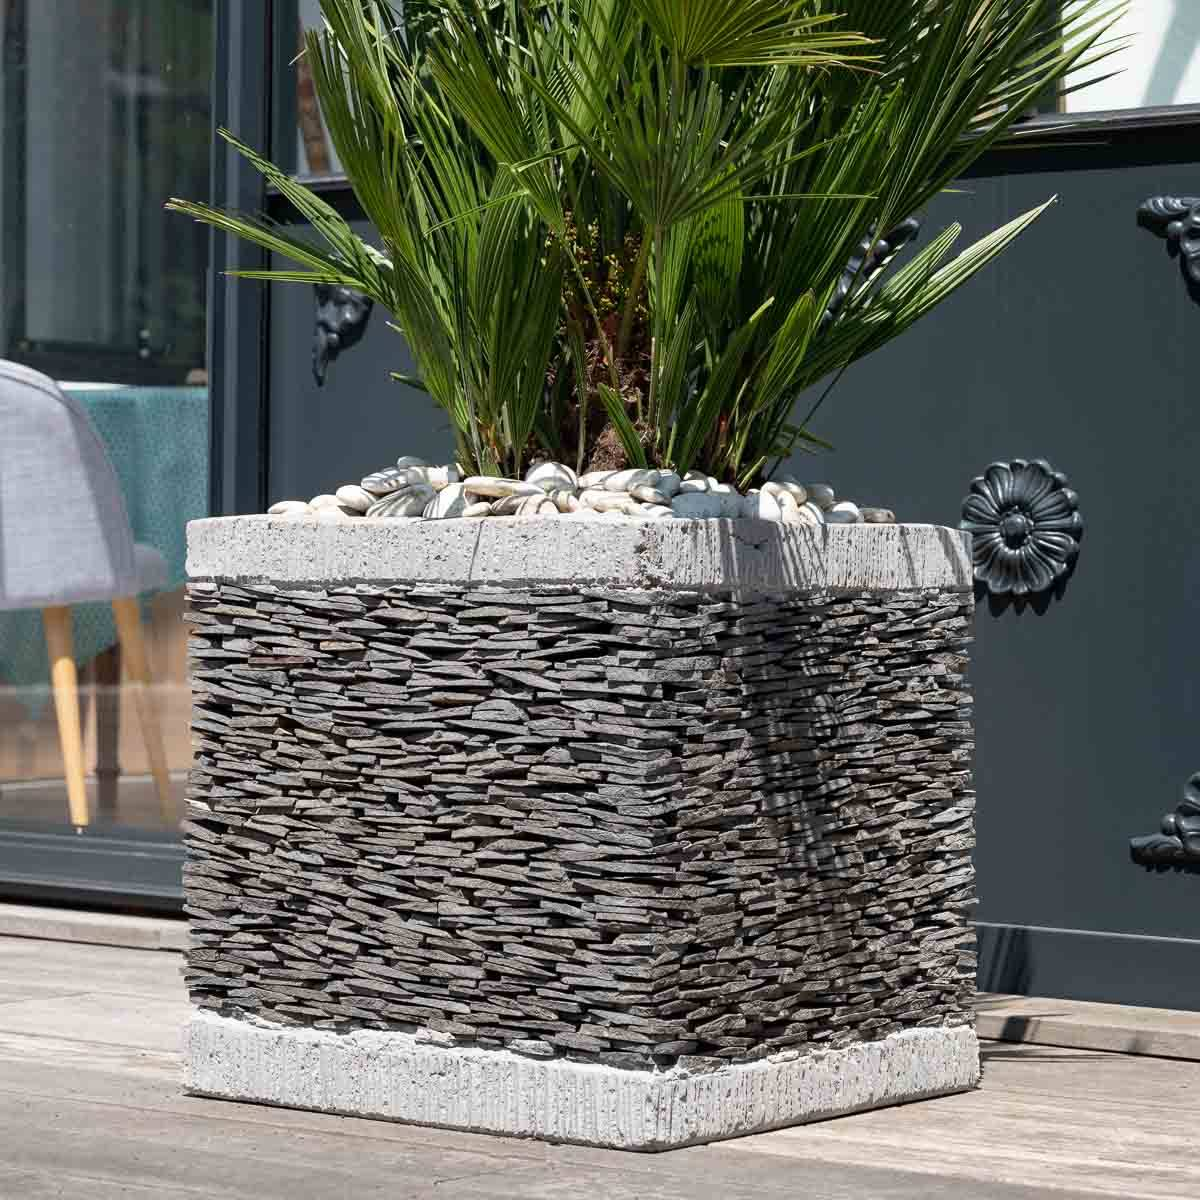 Wanda Collection Pot bac jardinière carré cube ardoise 50cm jardin terrasse pierre naturelle